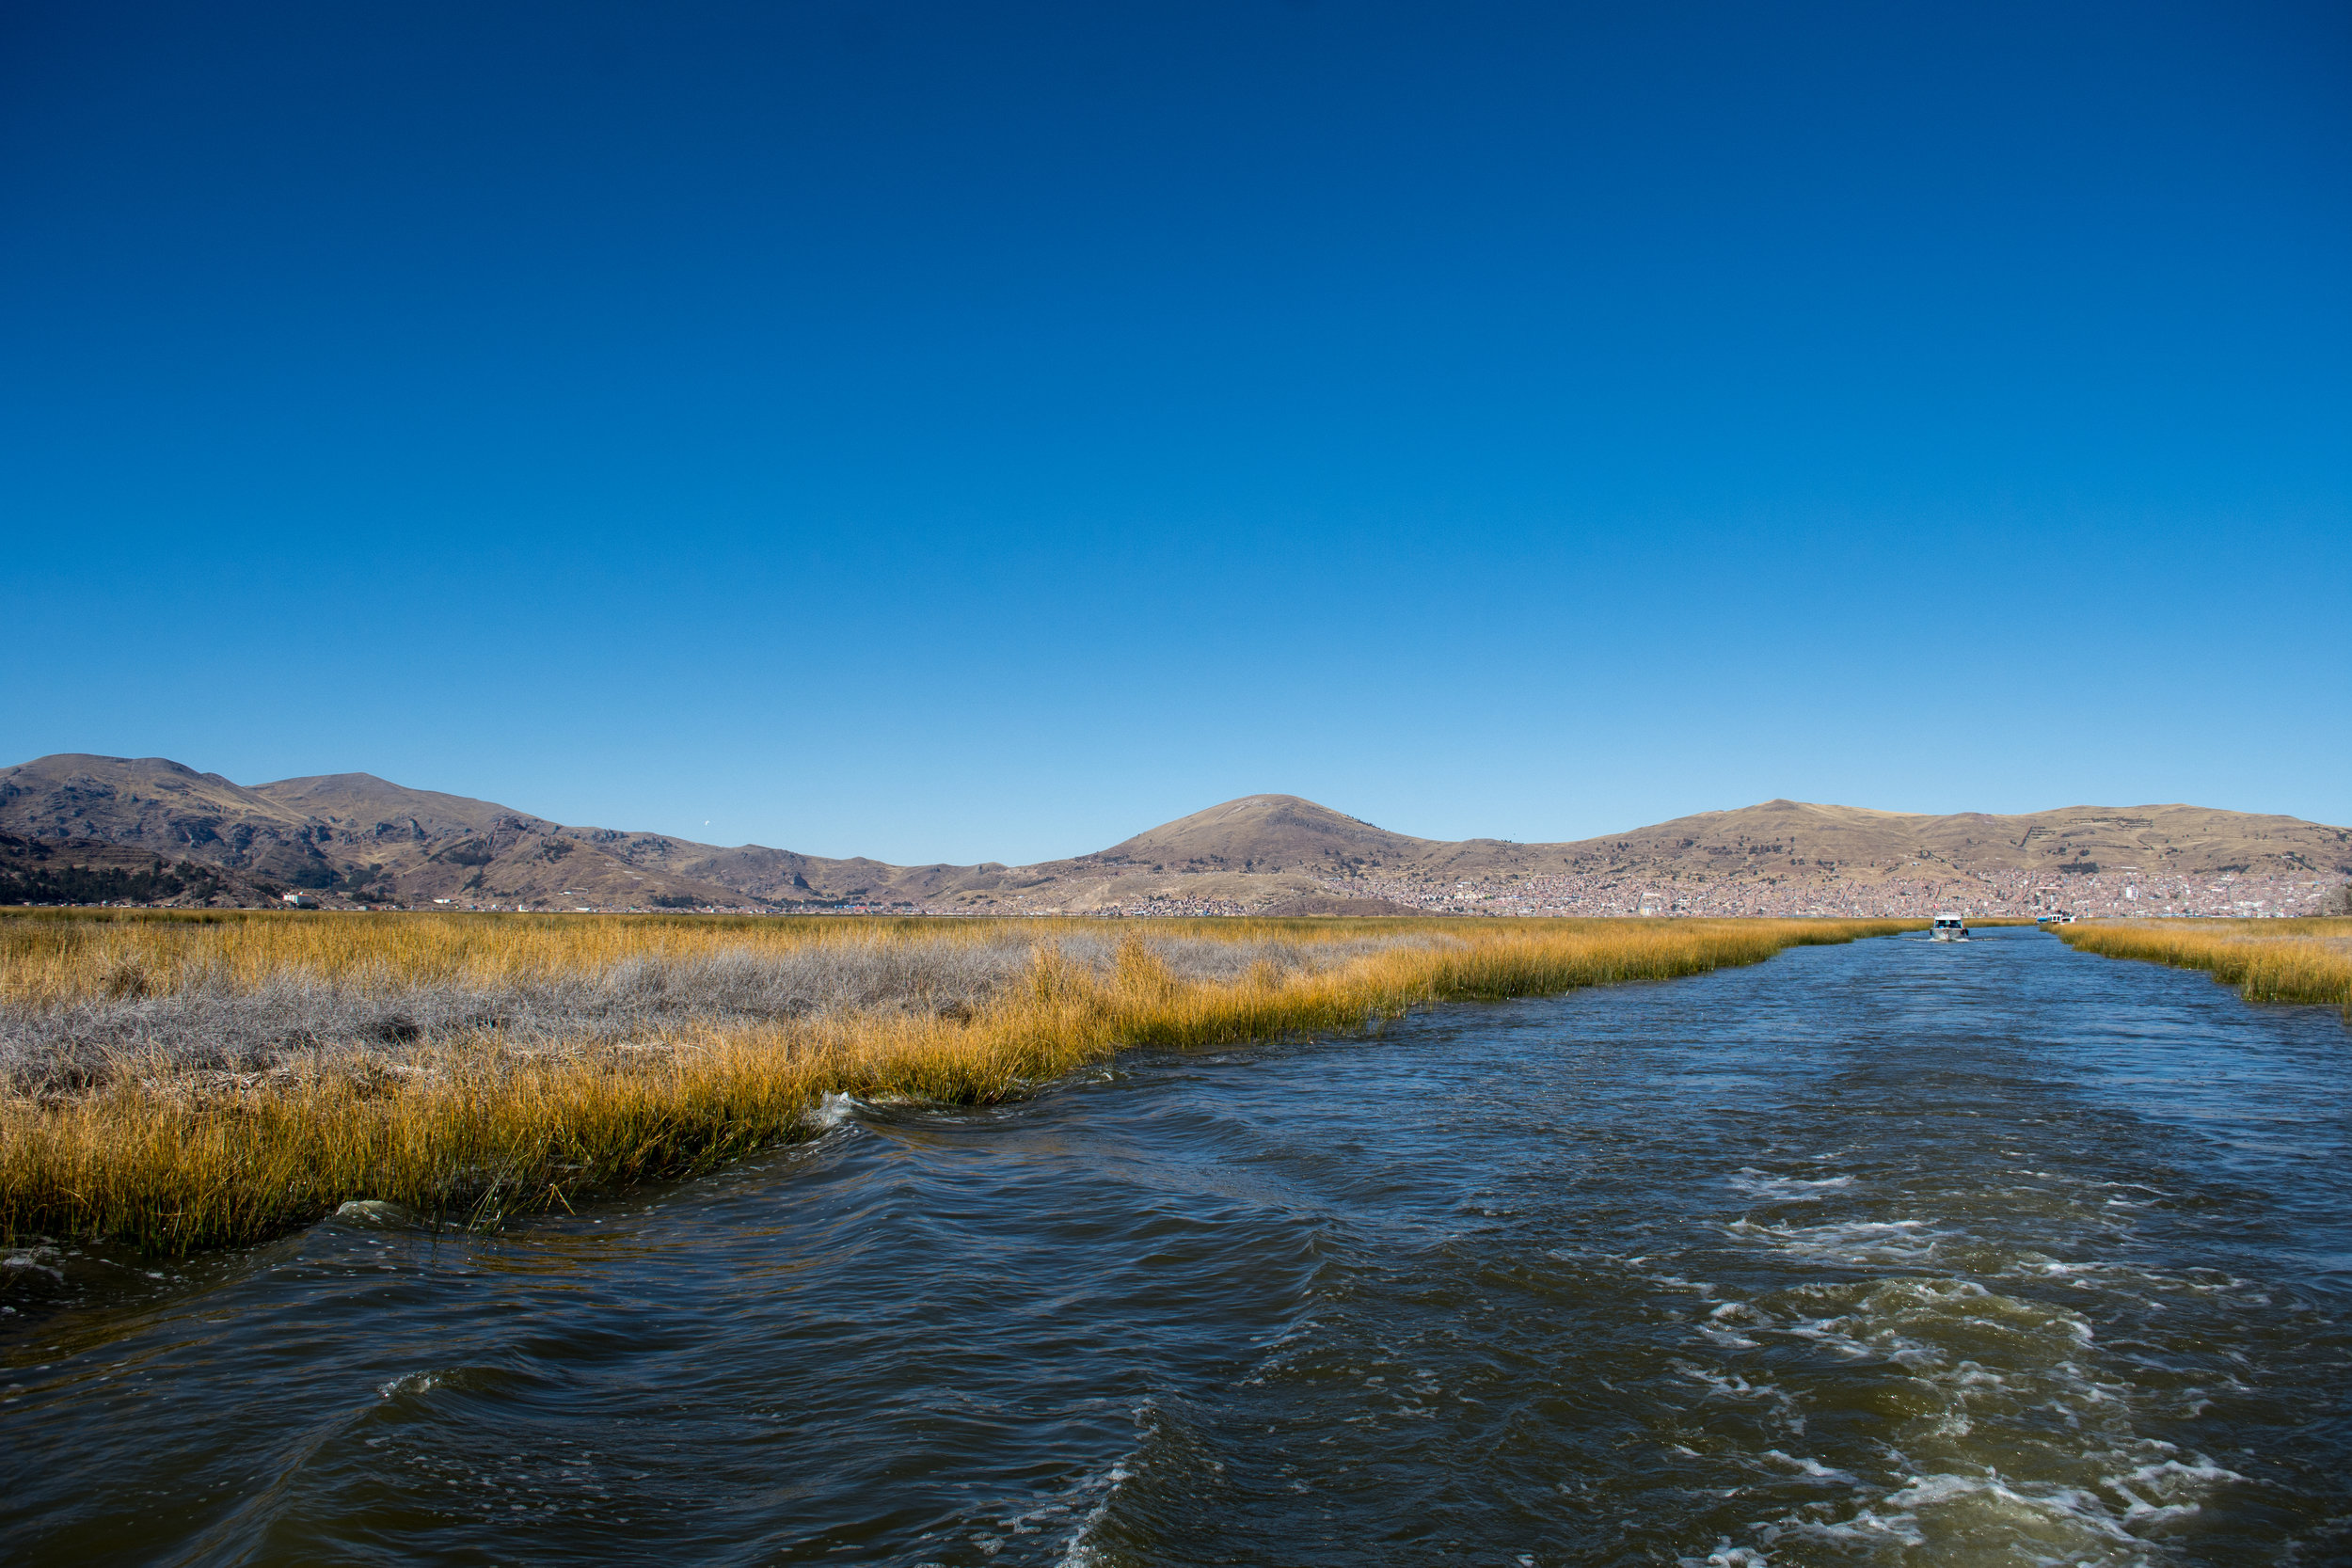 Puno from Lake Titicaca